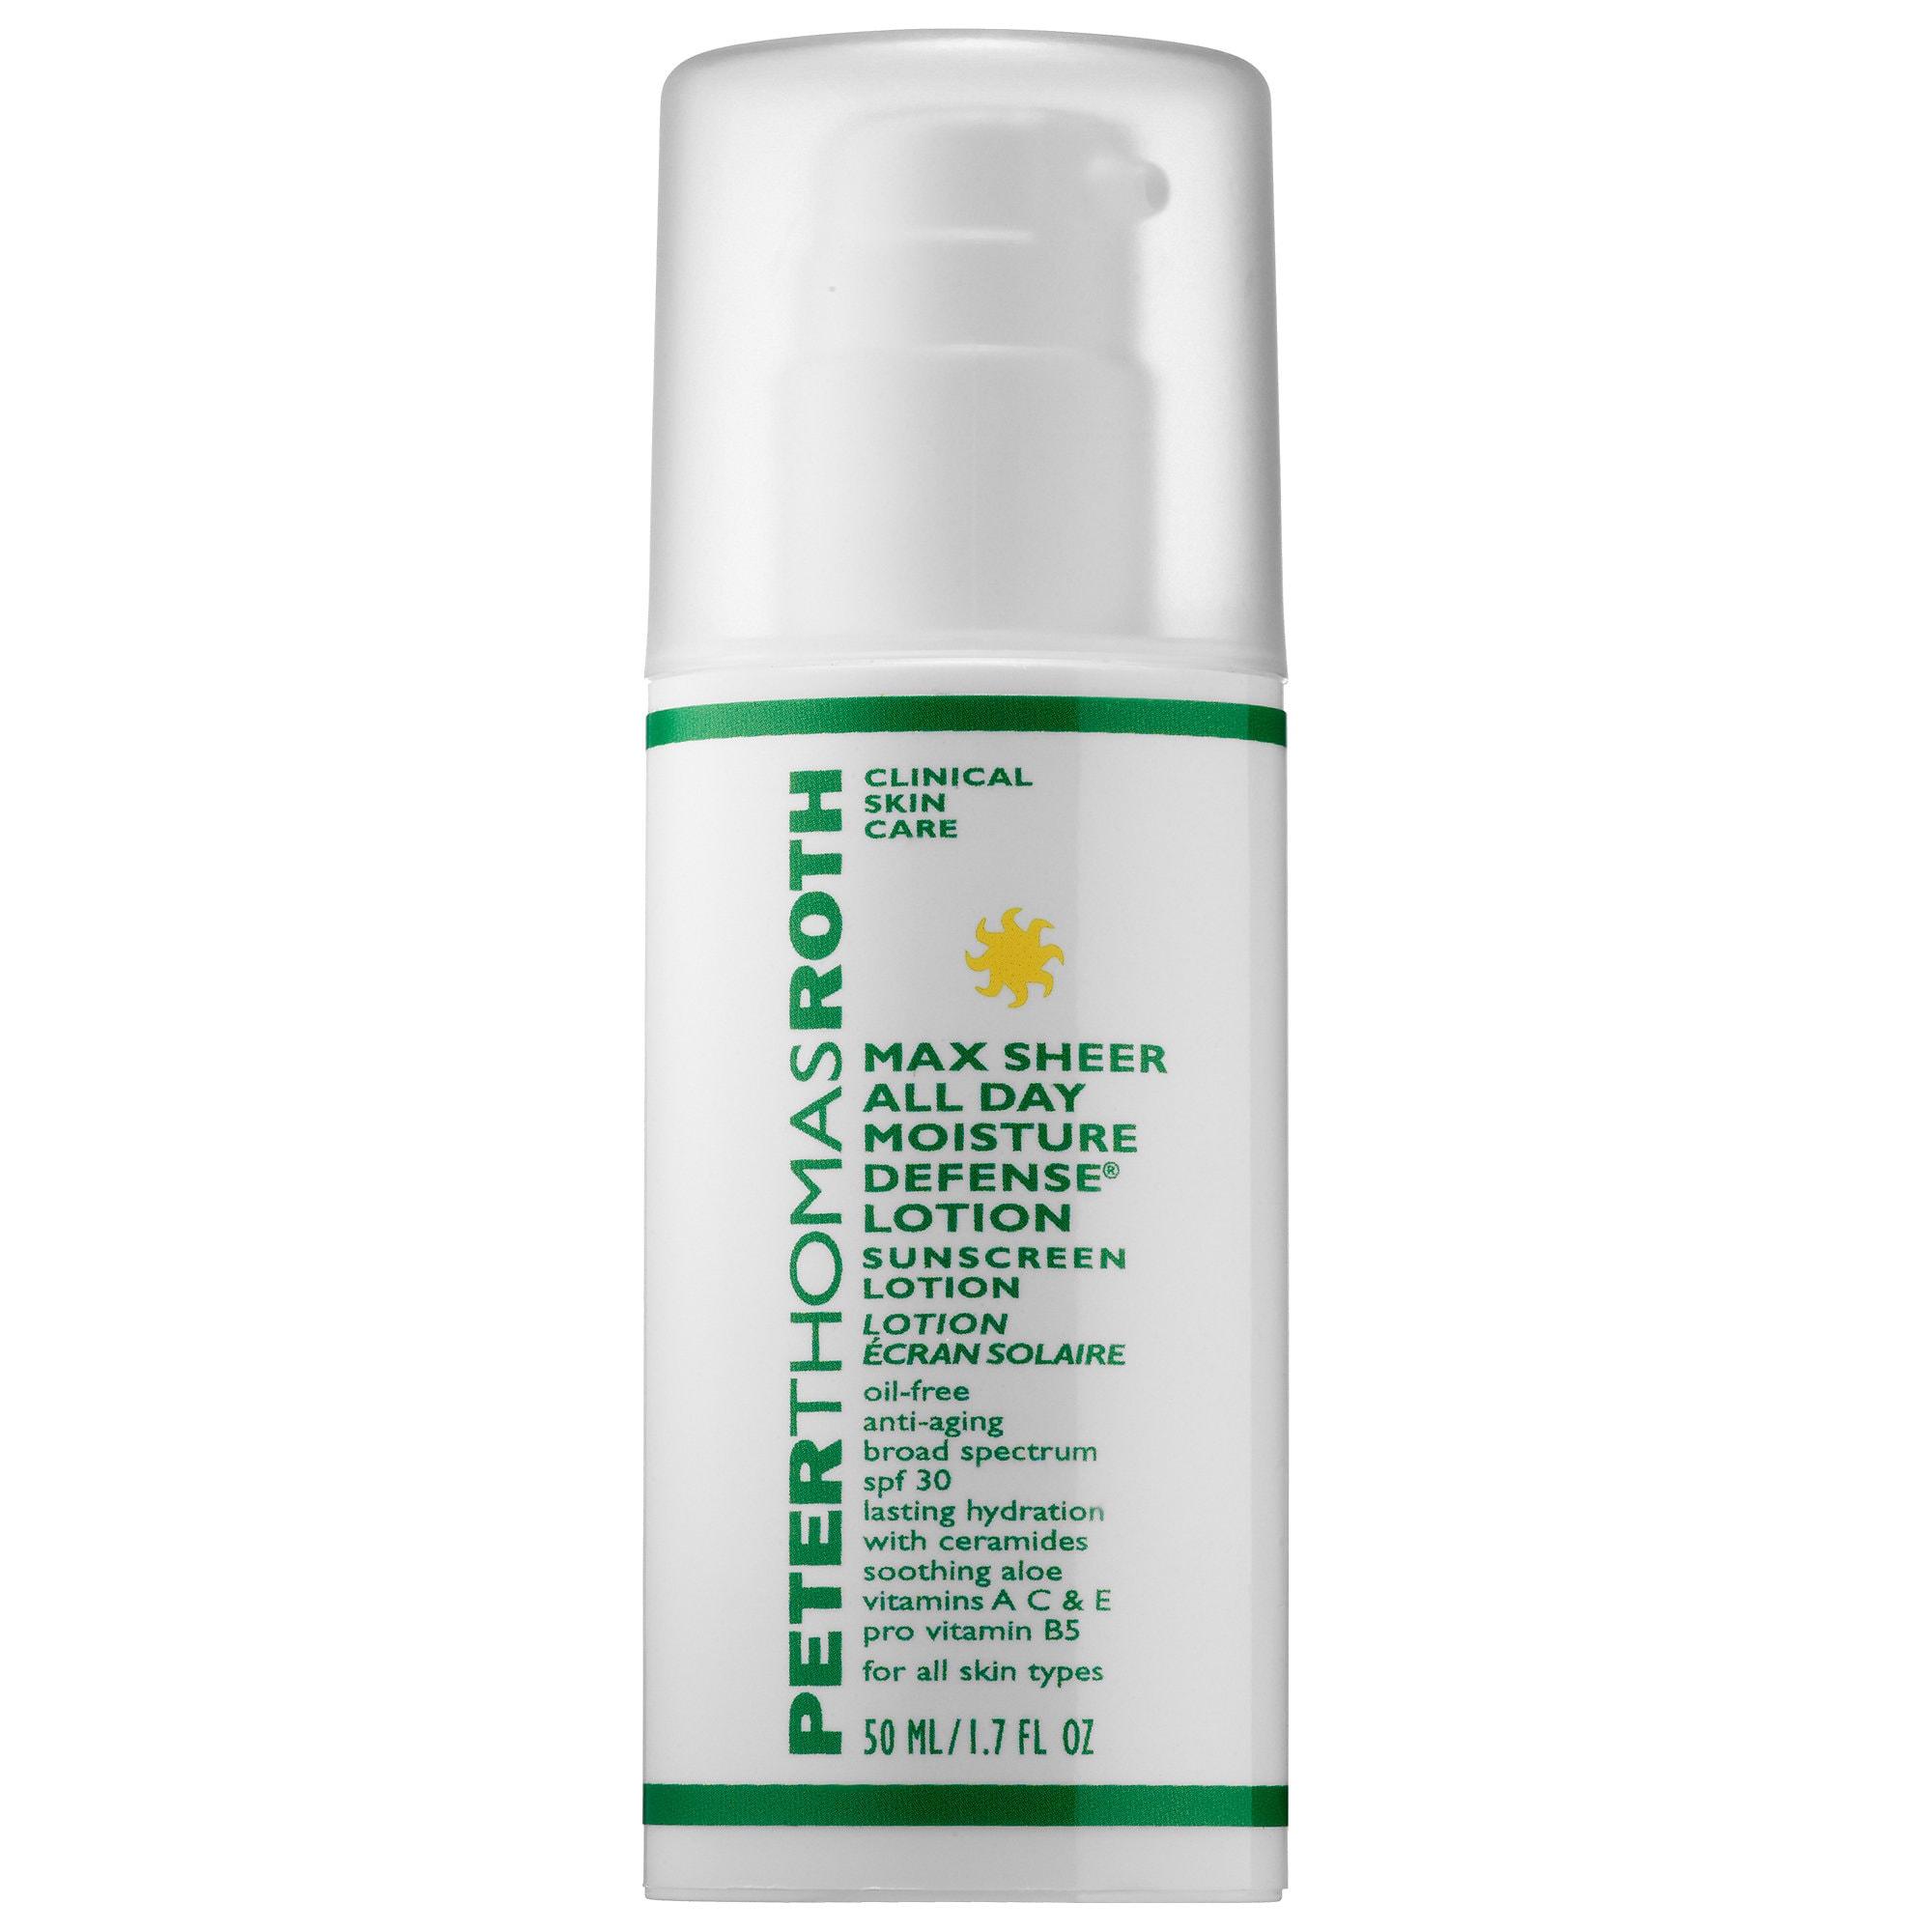 Sephora - Max Sheer All Day Moisture Defense Lotion SPF 30 Sunscreen Lotion - Peter Thomas Roth   Sephora